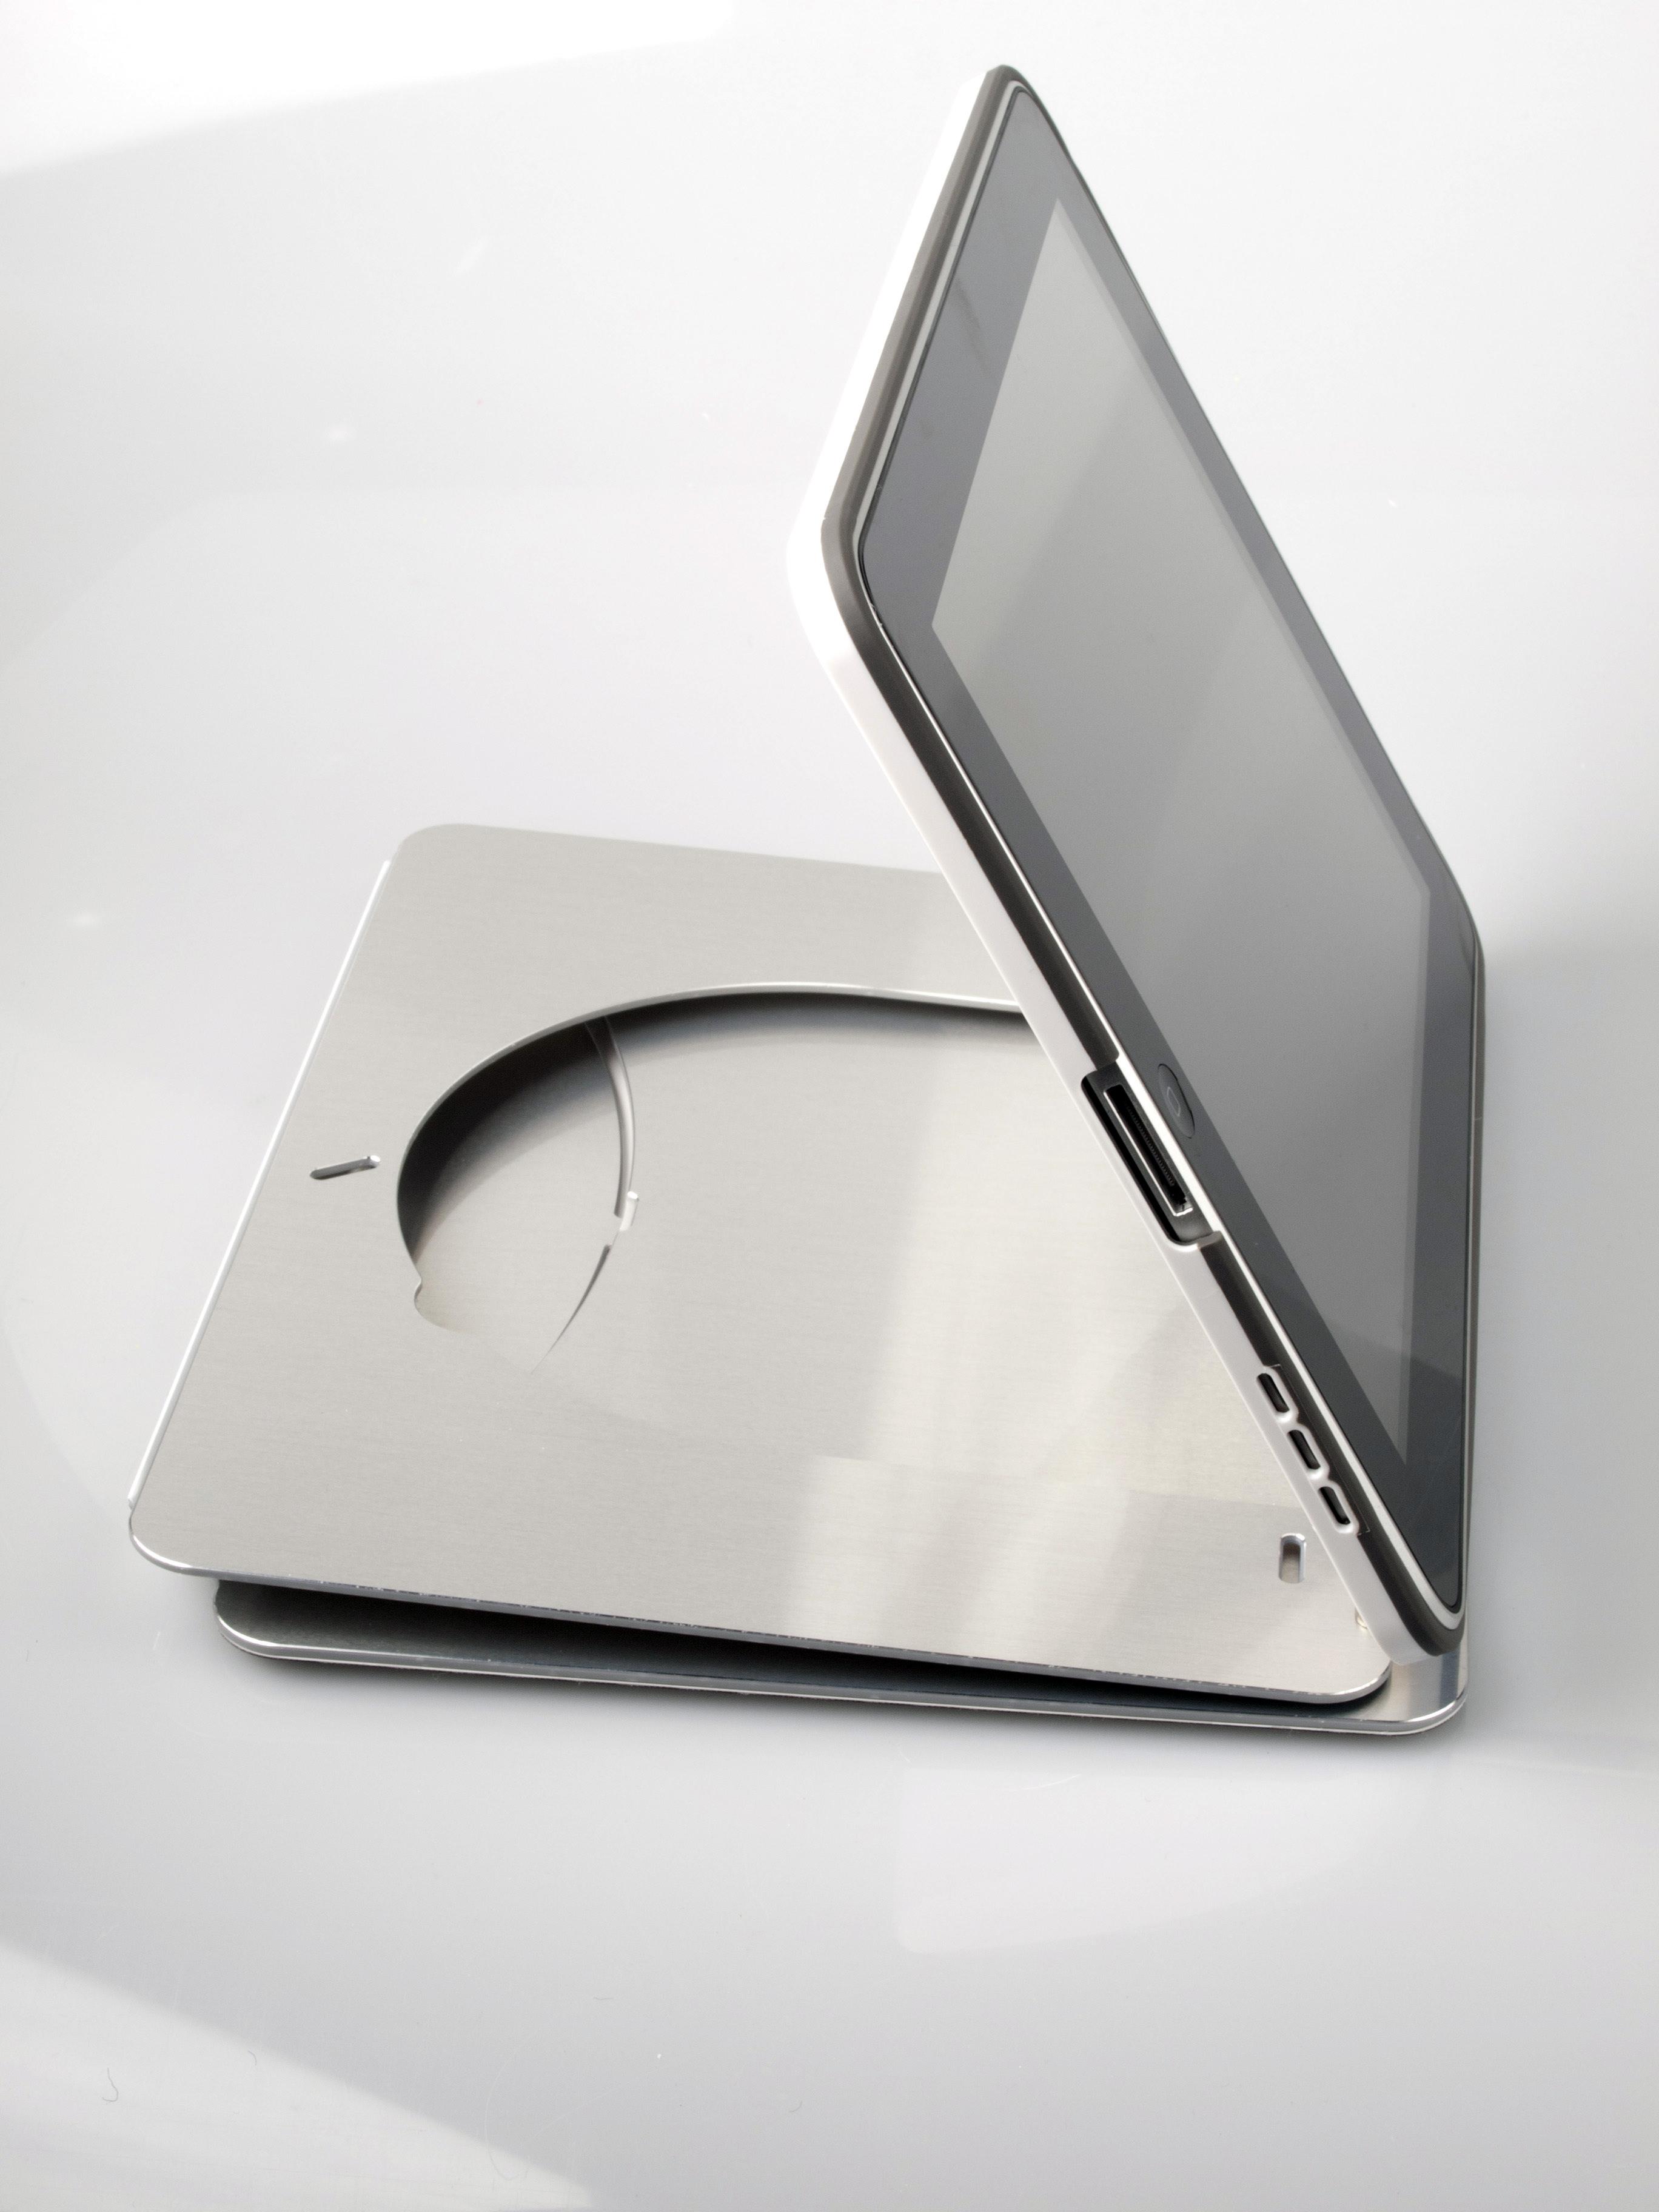 apple ipad instruction manual